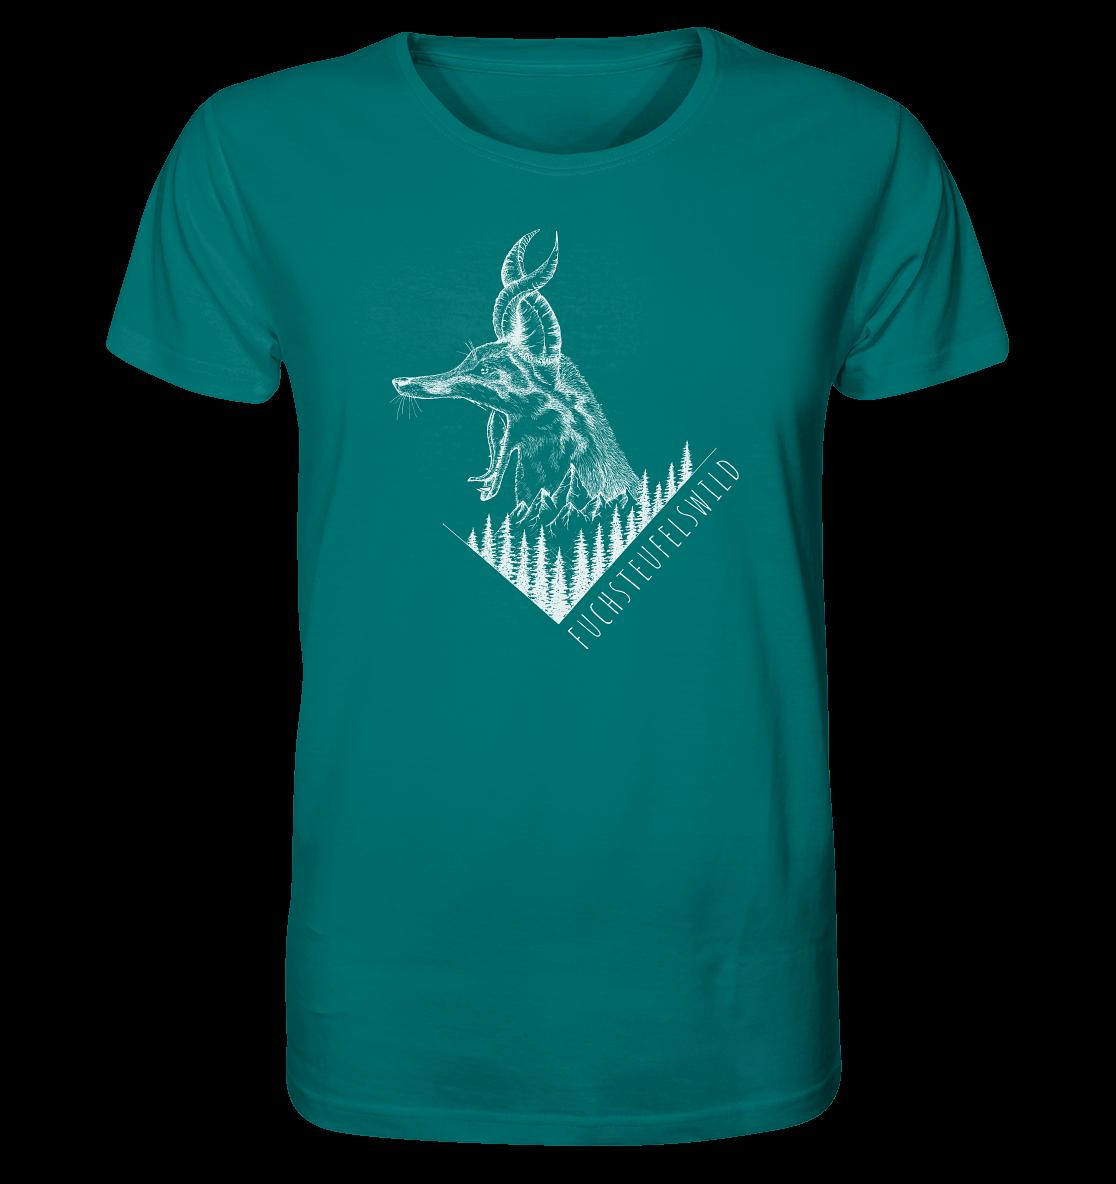 front-organic-shirt-007373-1116x-8.png